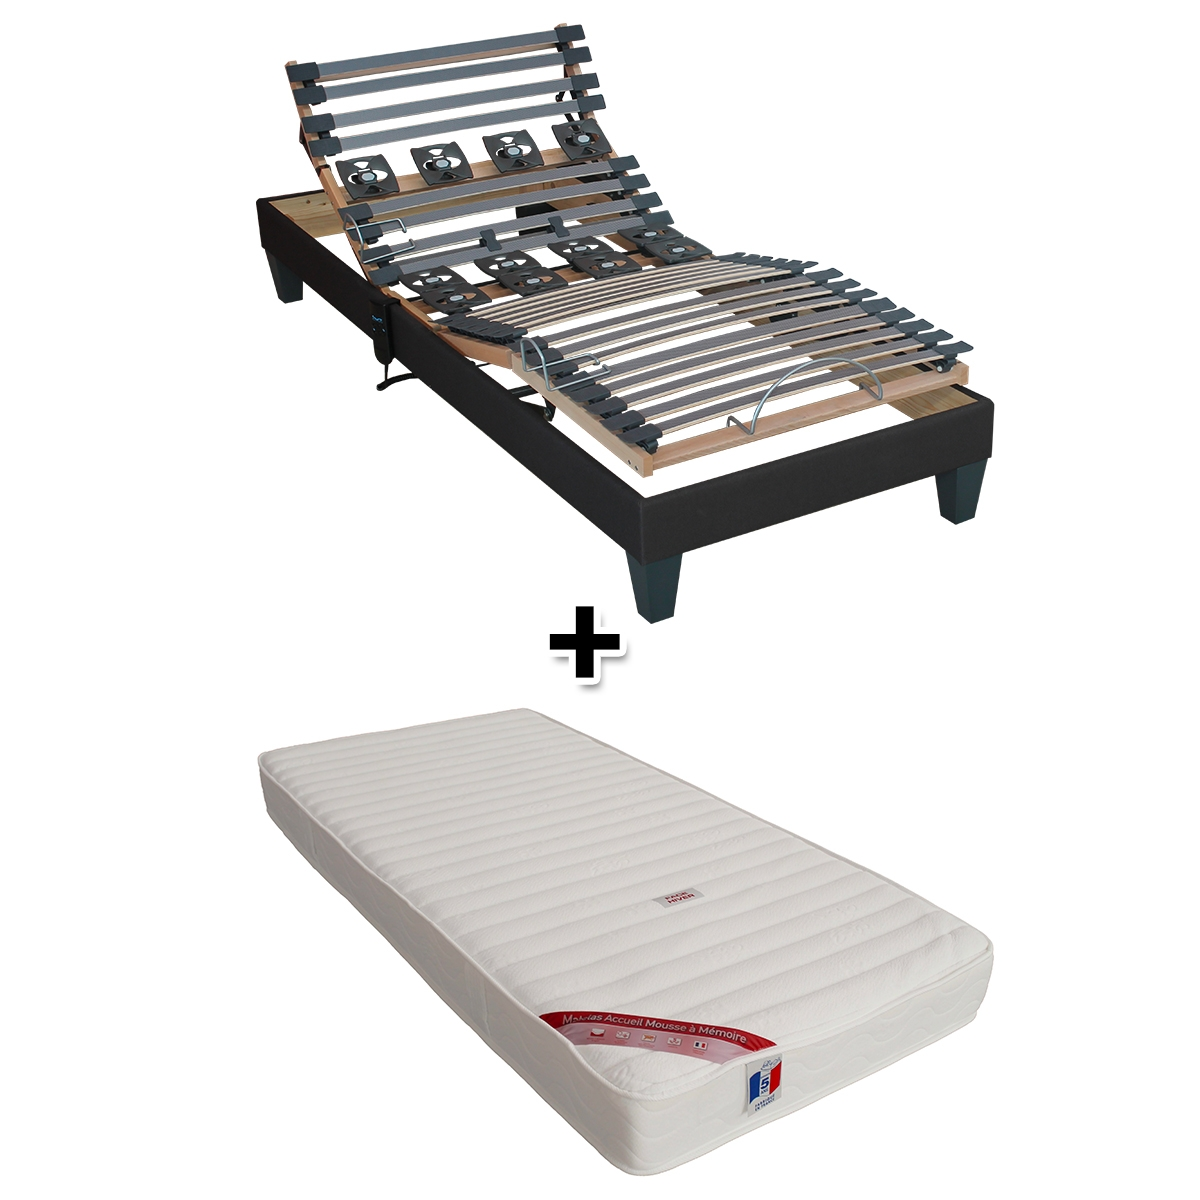 soldes literie de relaxation pas cher. Black Bedroom Furniture Sets. Home Design Ideas